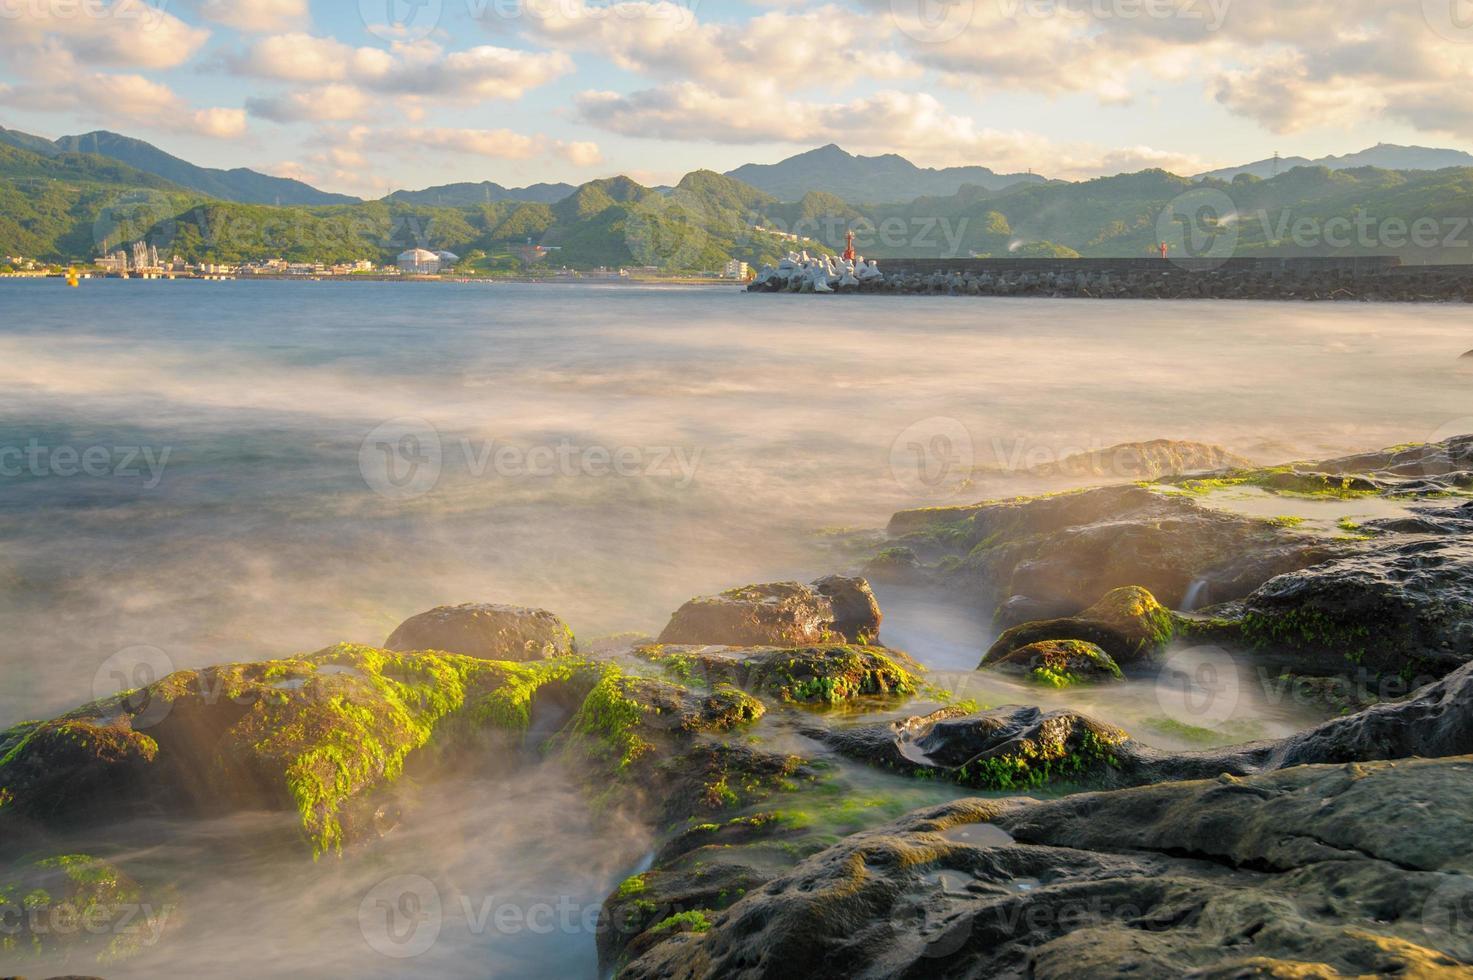 arrecife verde foto